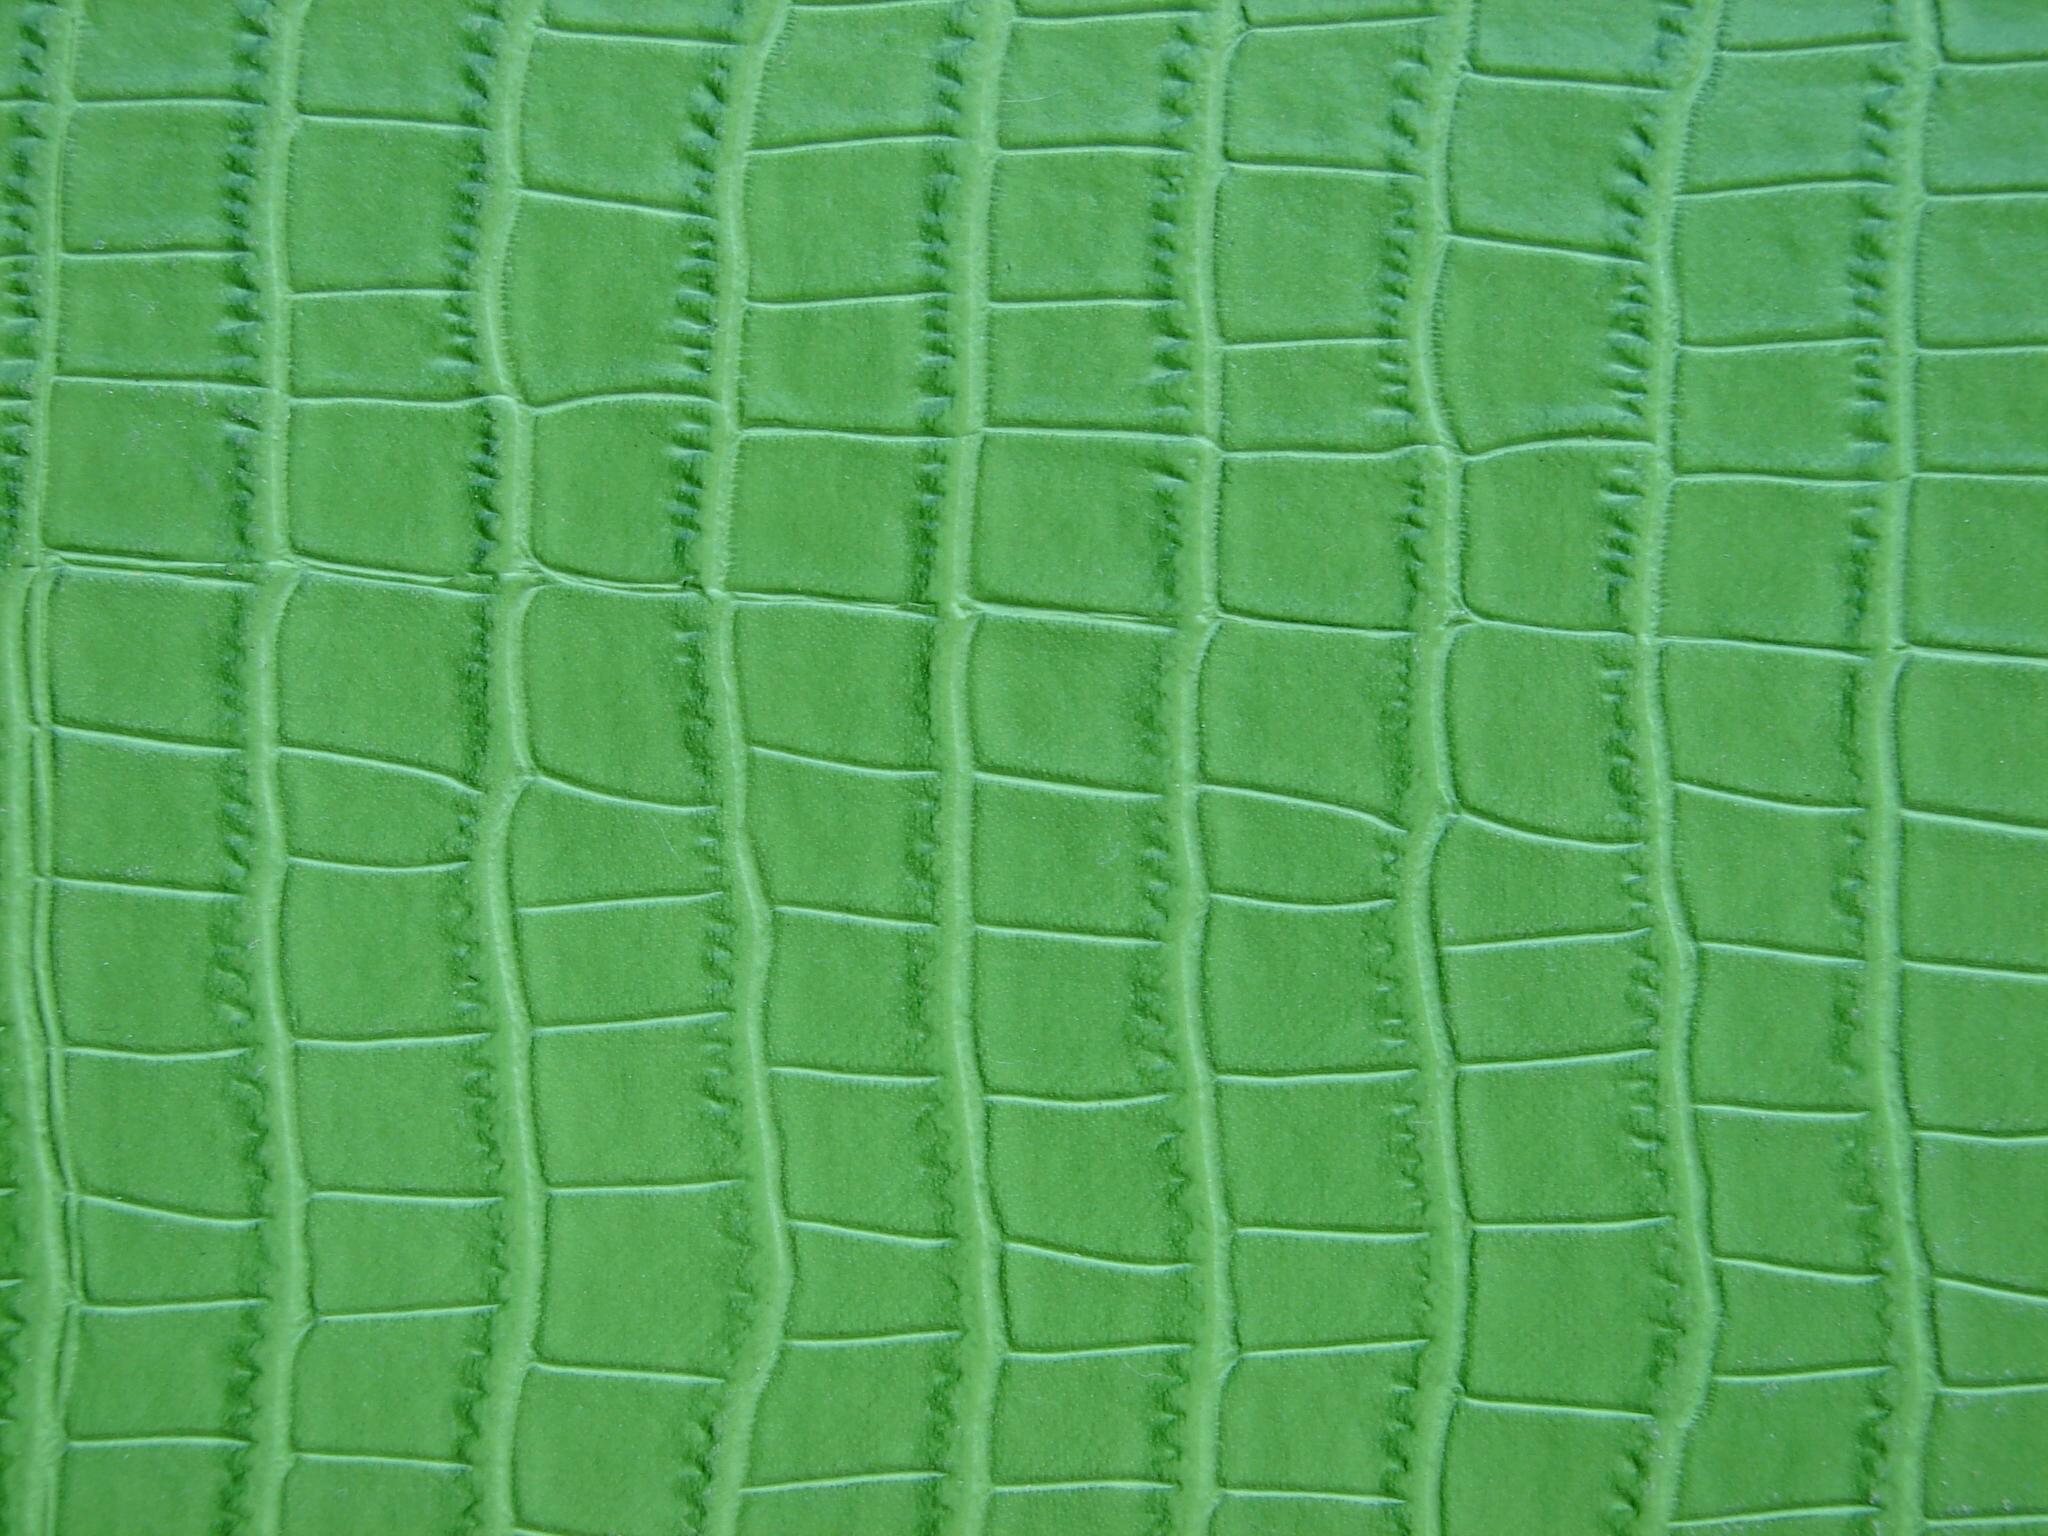 Fake Alligator Skin Texture by FantasyStock on DeviantArt